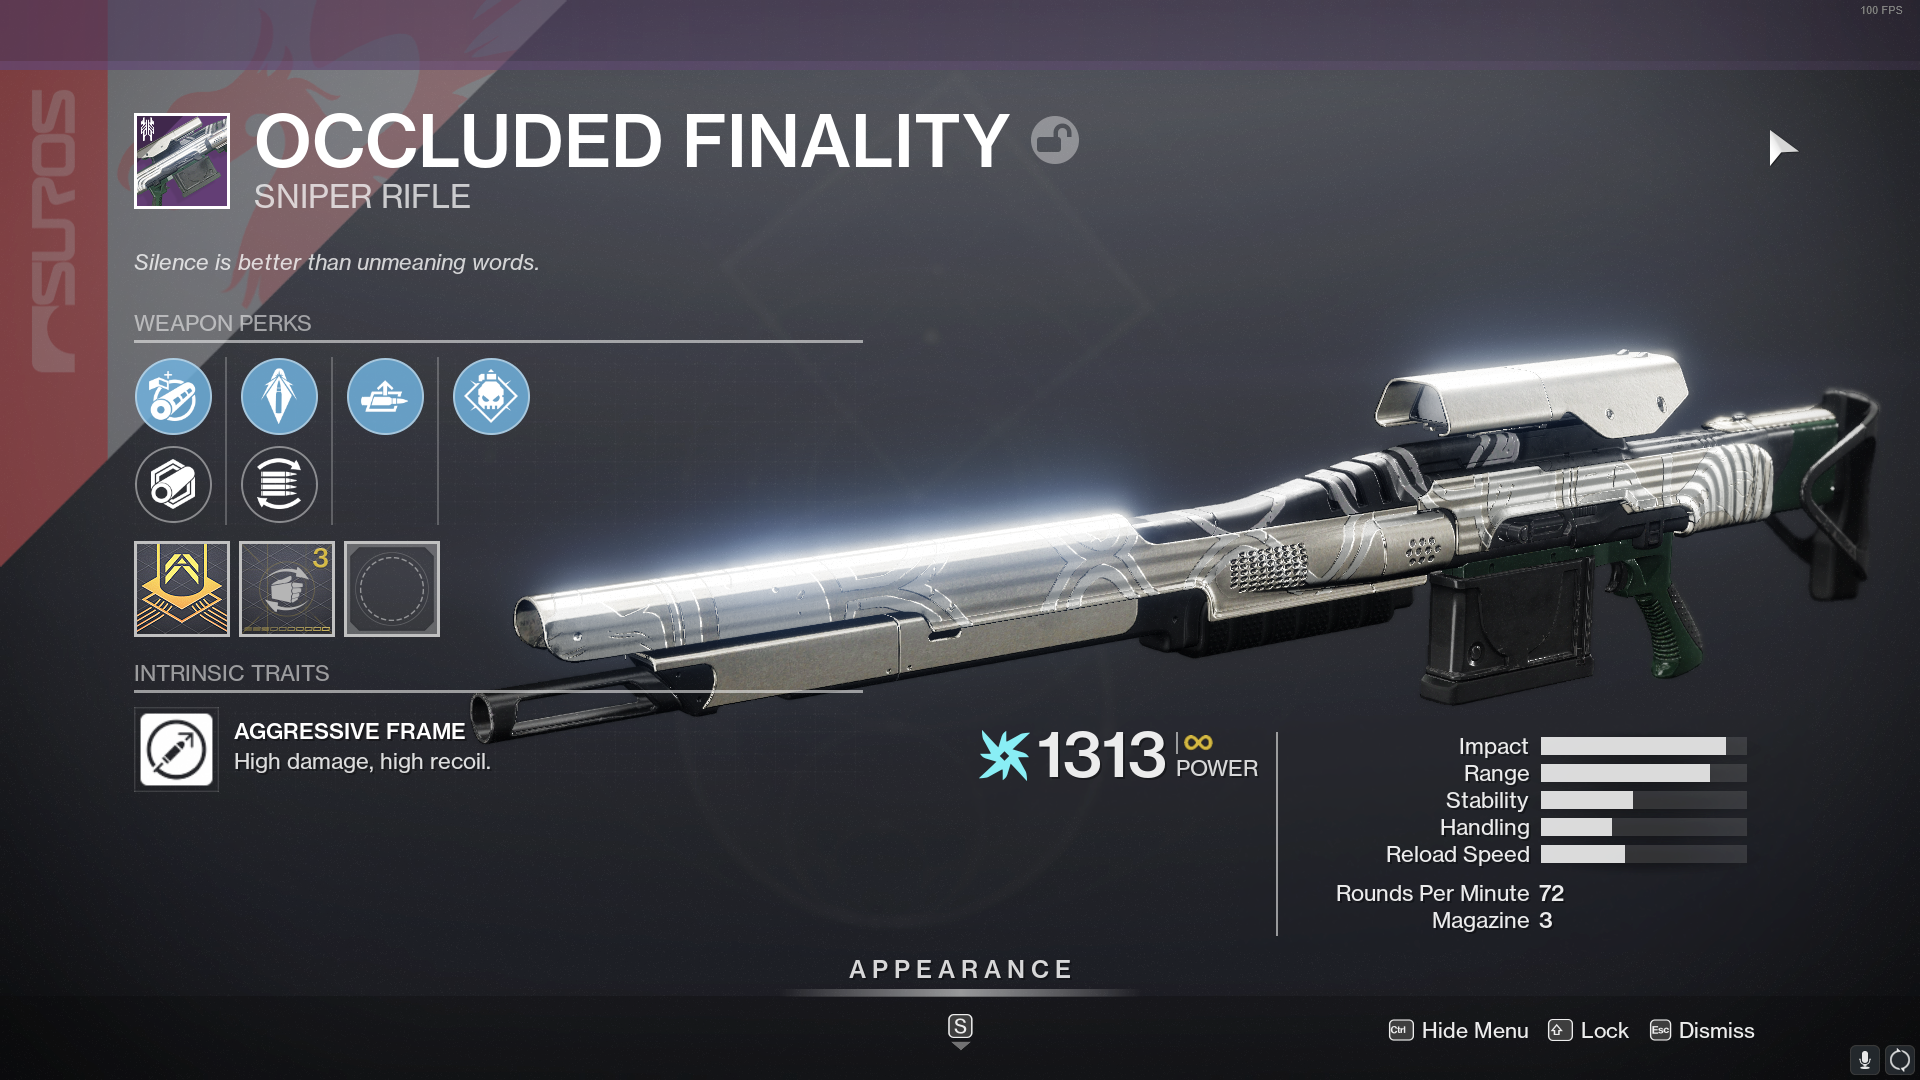 Destiny 2 Occluded Finality God Roll